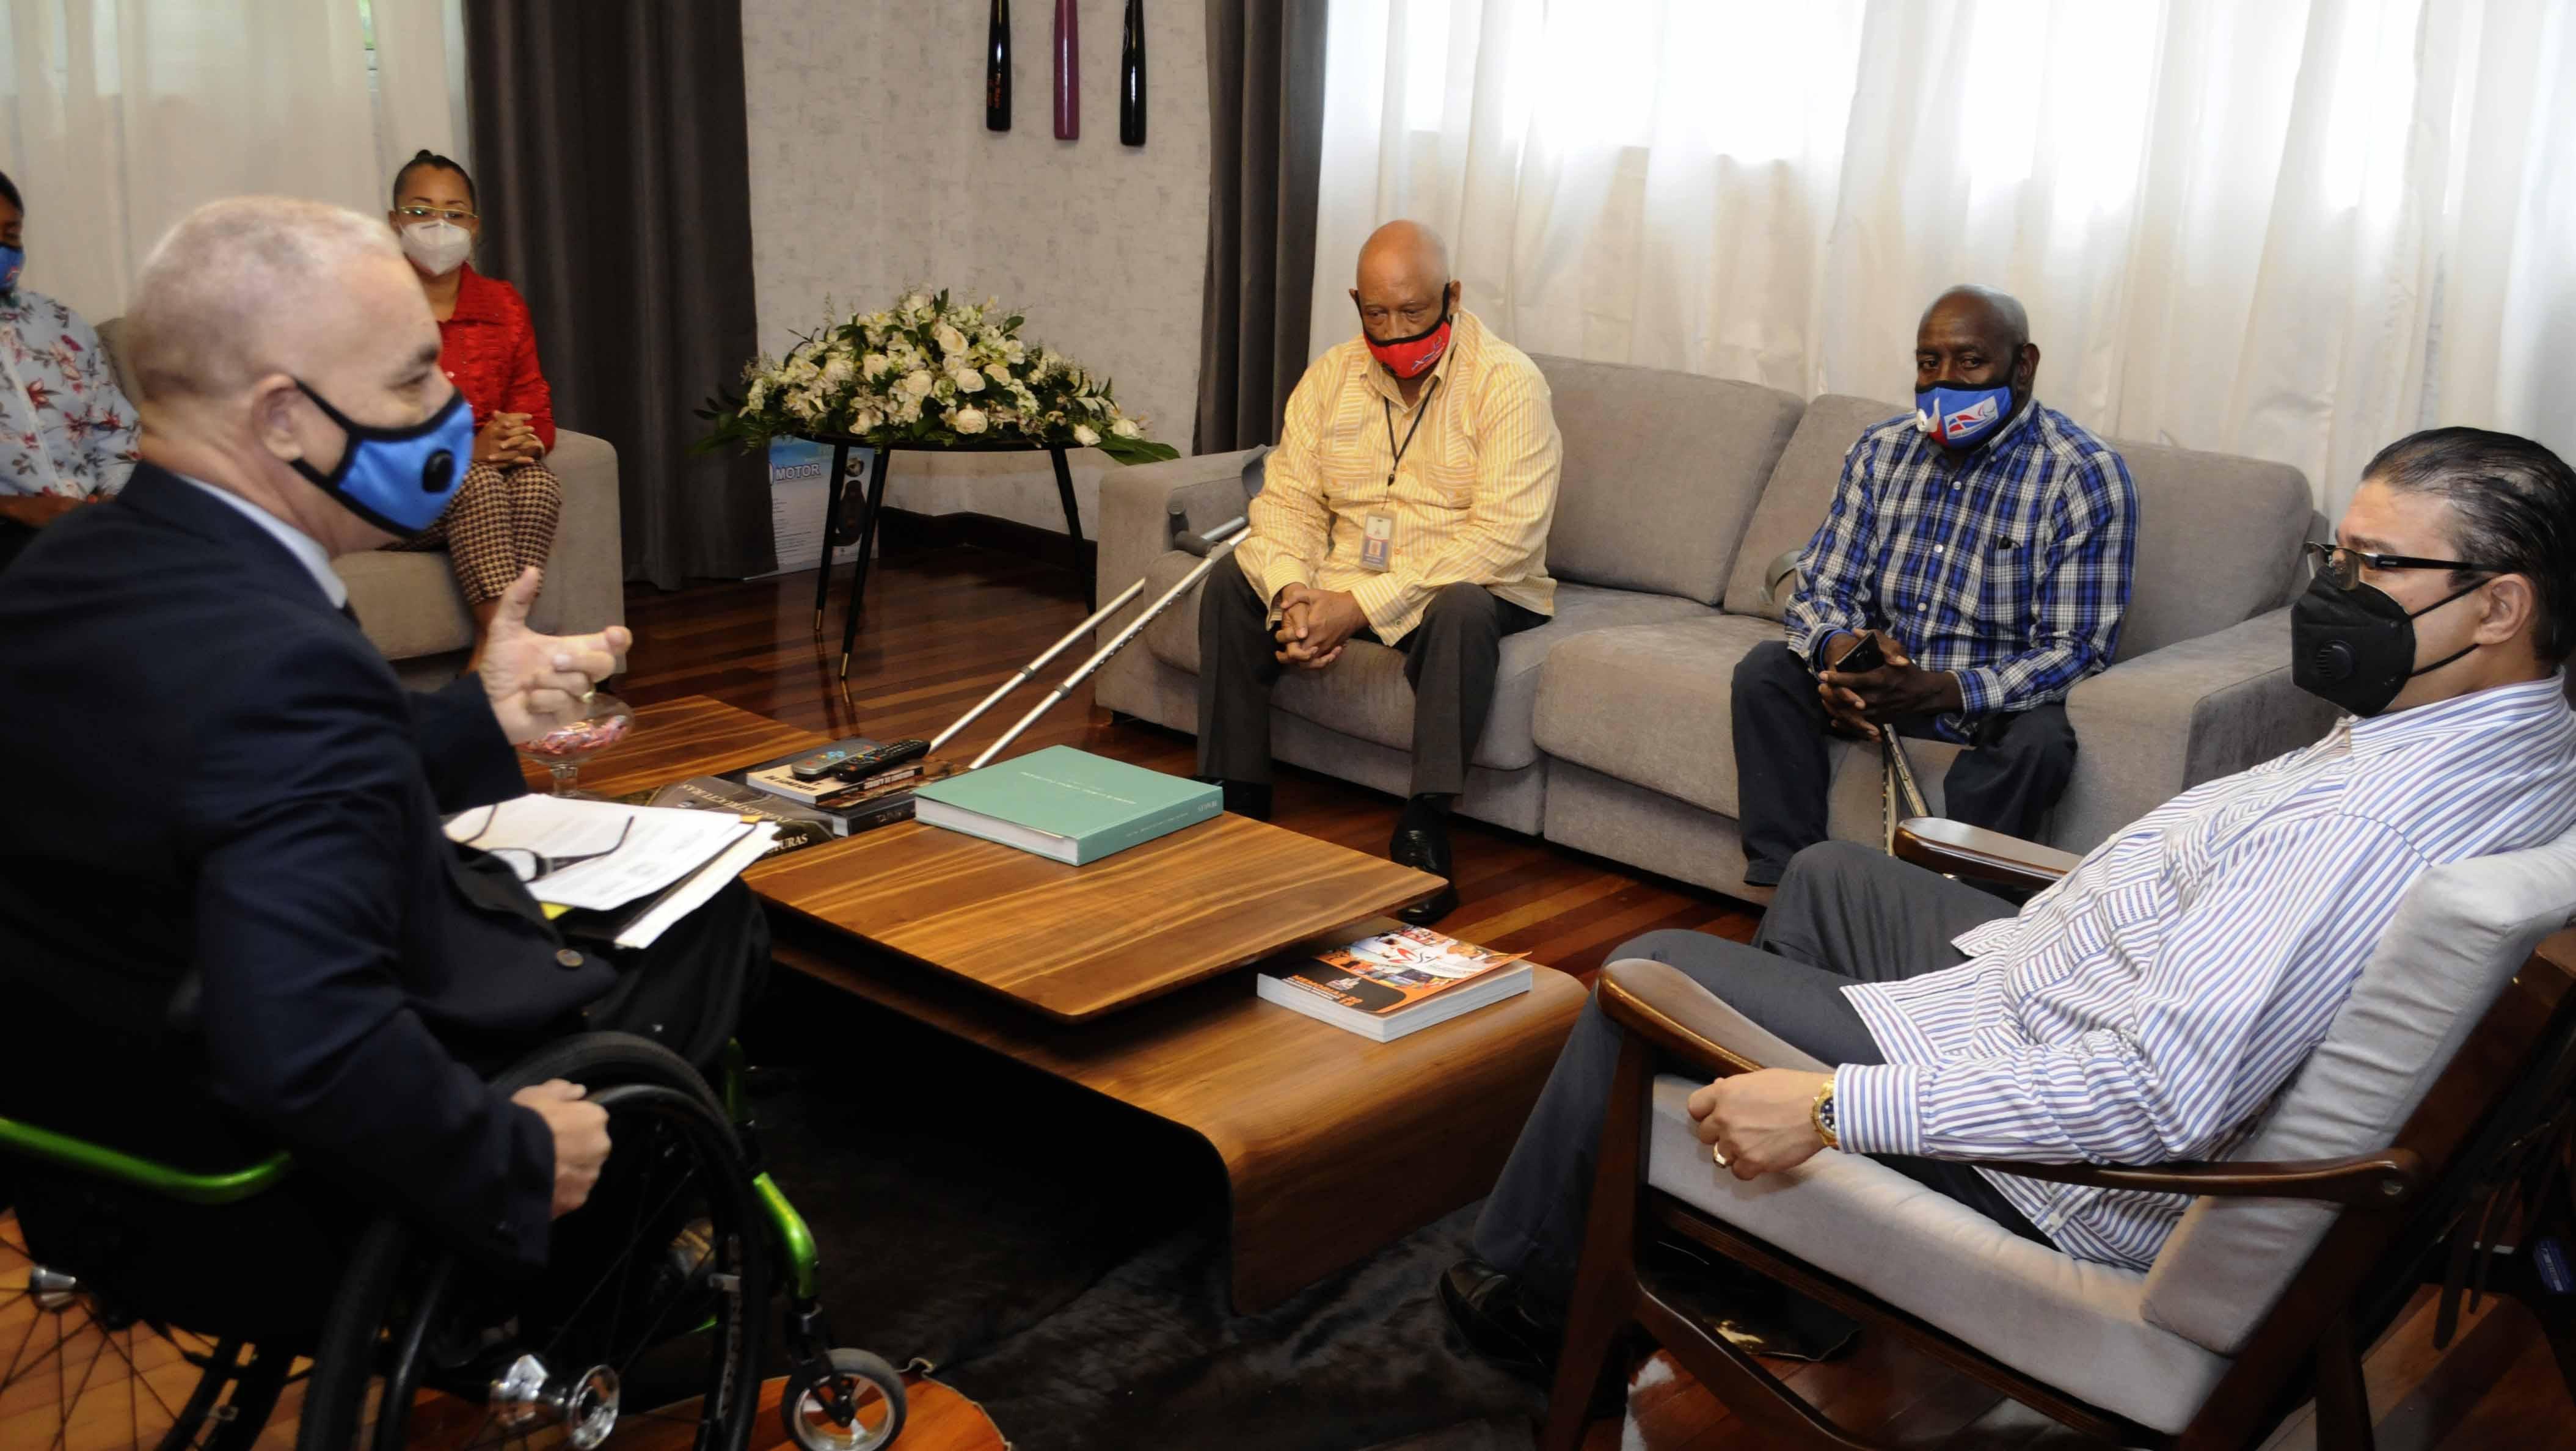 Ministro de Deportes asegura respaldo a los atletas paralímpicos